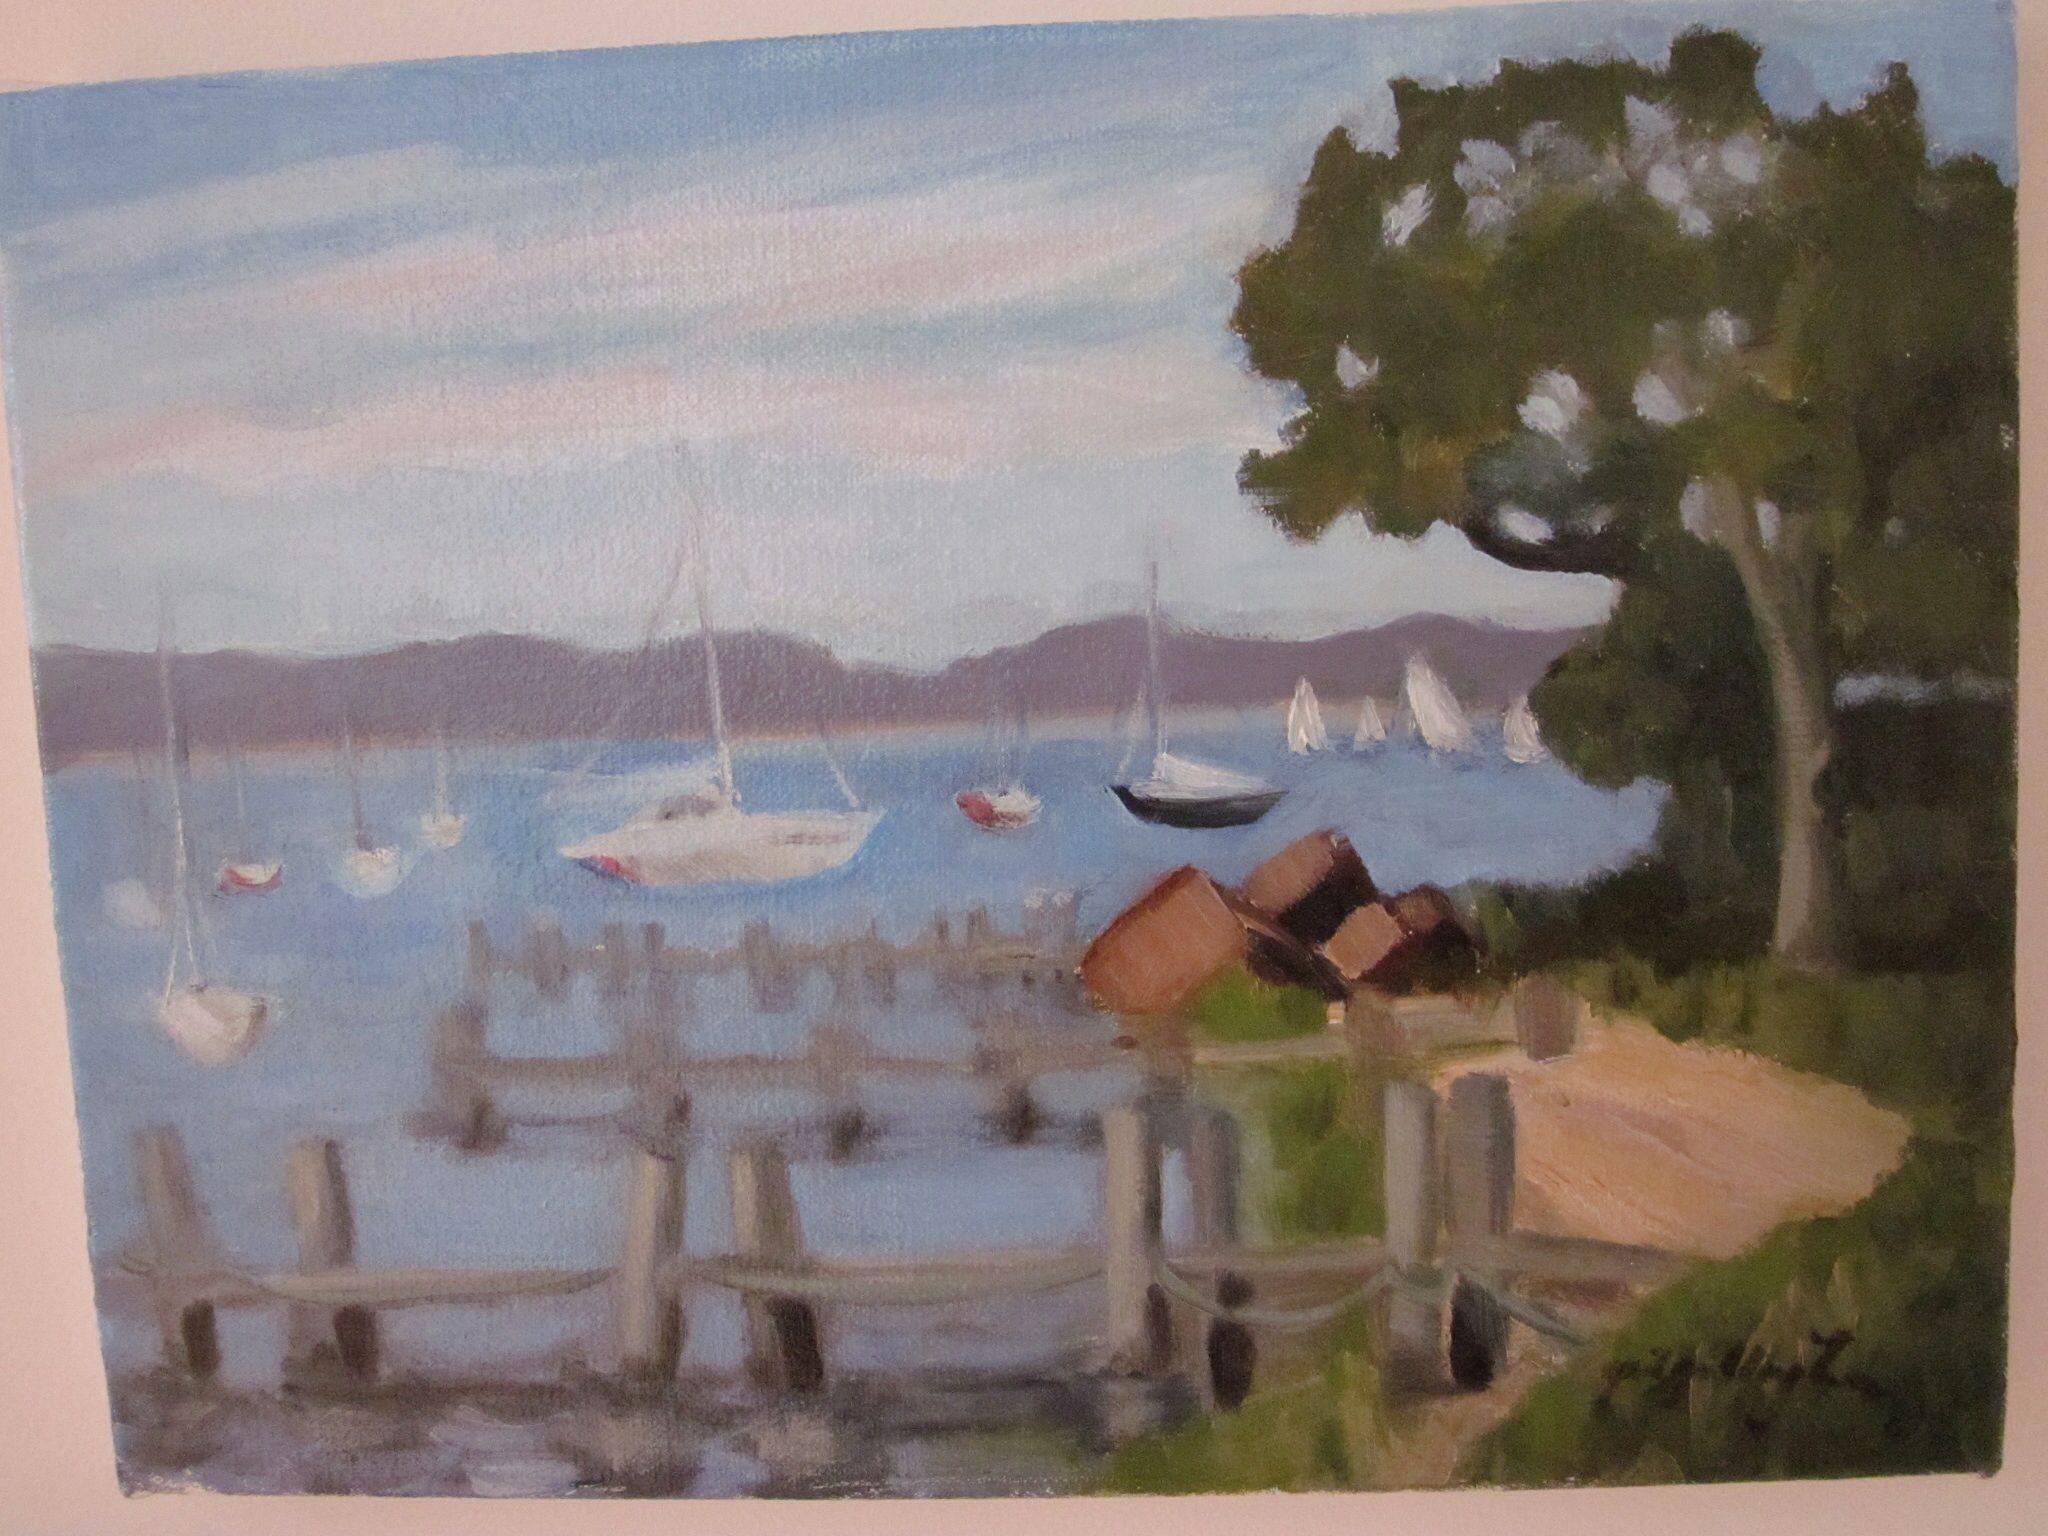 Dering harbor shelter island shelter island art painting